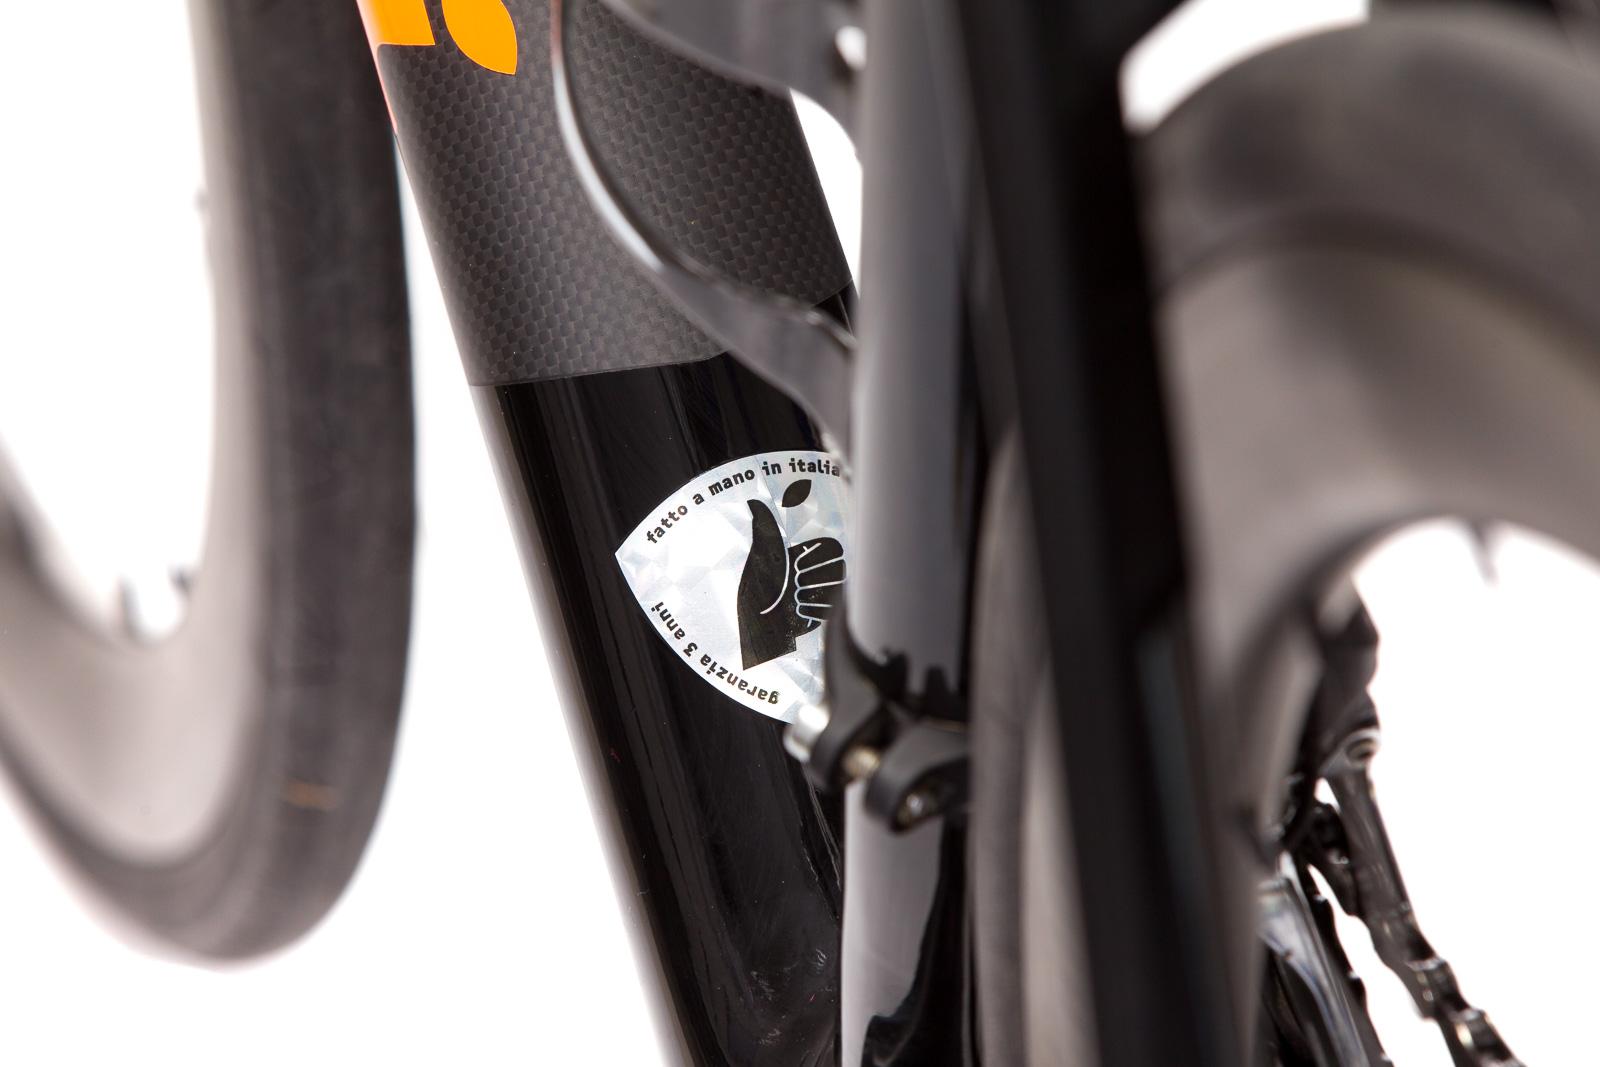 Pasculli Tomarlo Disc #roadbikedisco - Foto 30 / 41